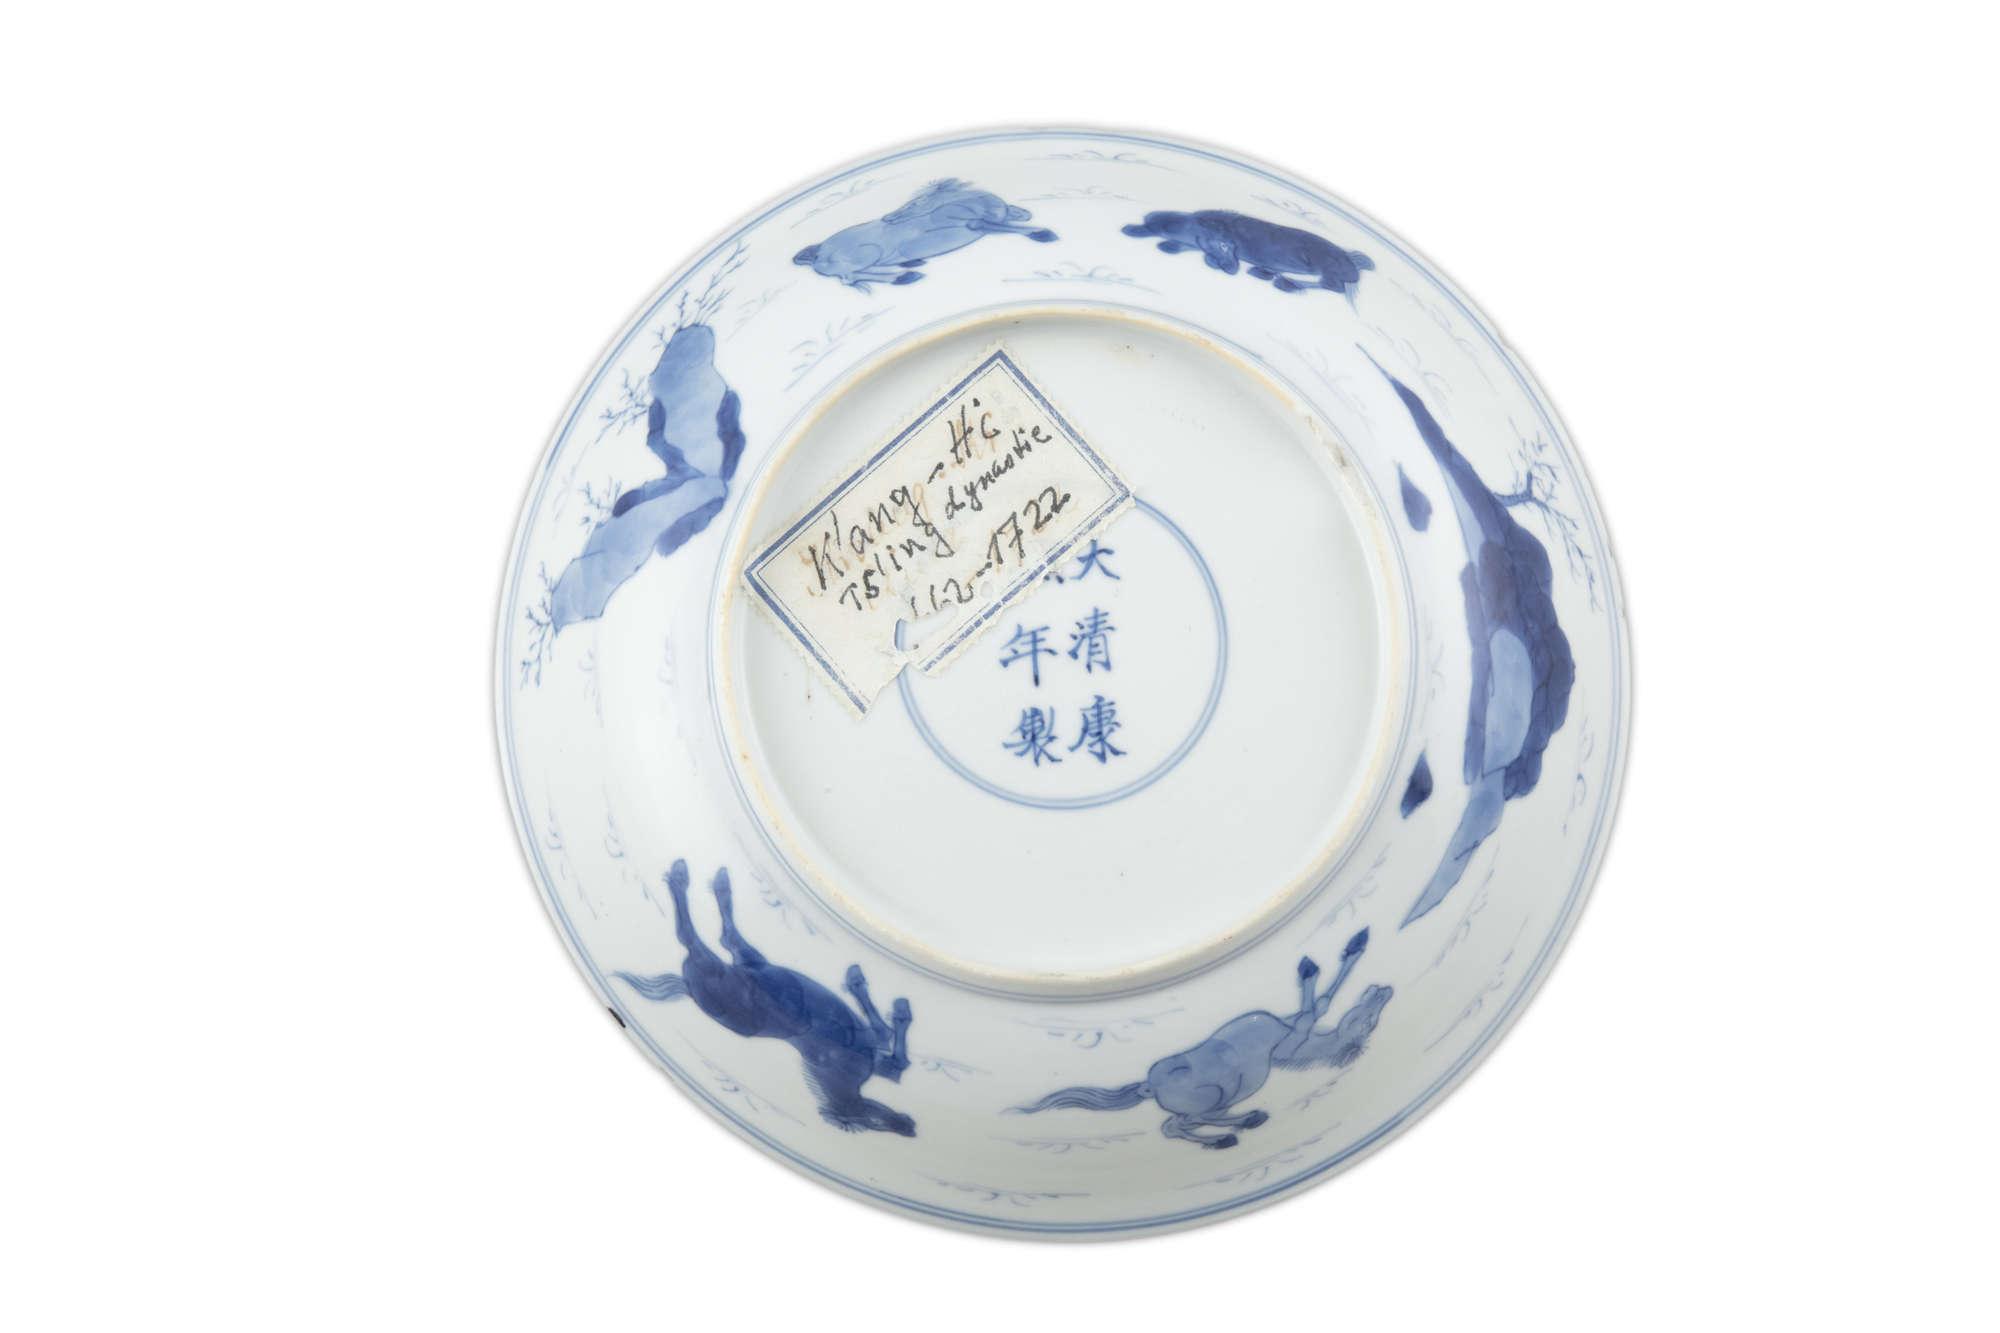 A BLUE AND WHITE 'EIGHT HORSES OF WANG MU' PORCELAIN DISH China, Qing Dynasty, Kangxi mark and - Image 5 of 17